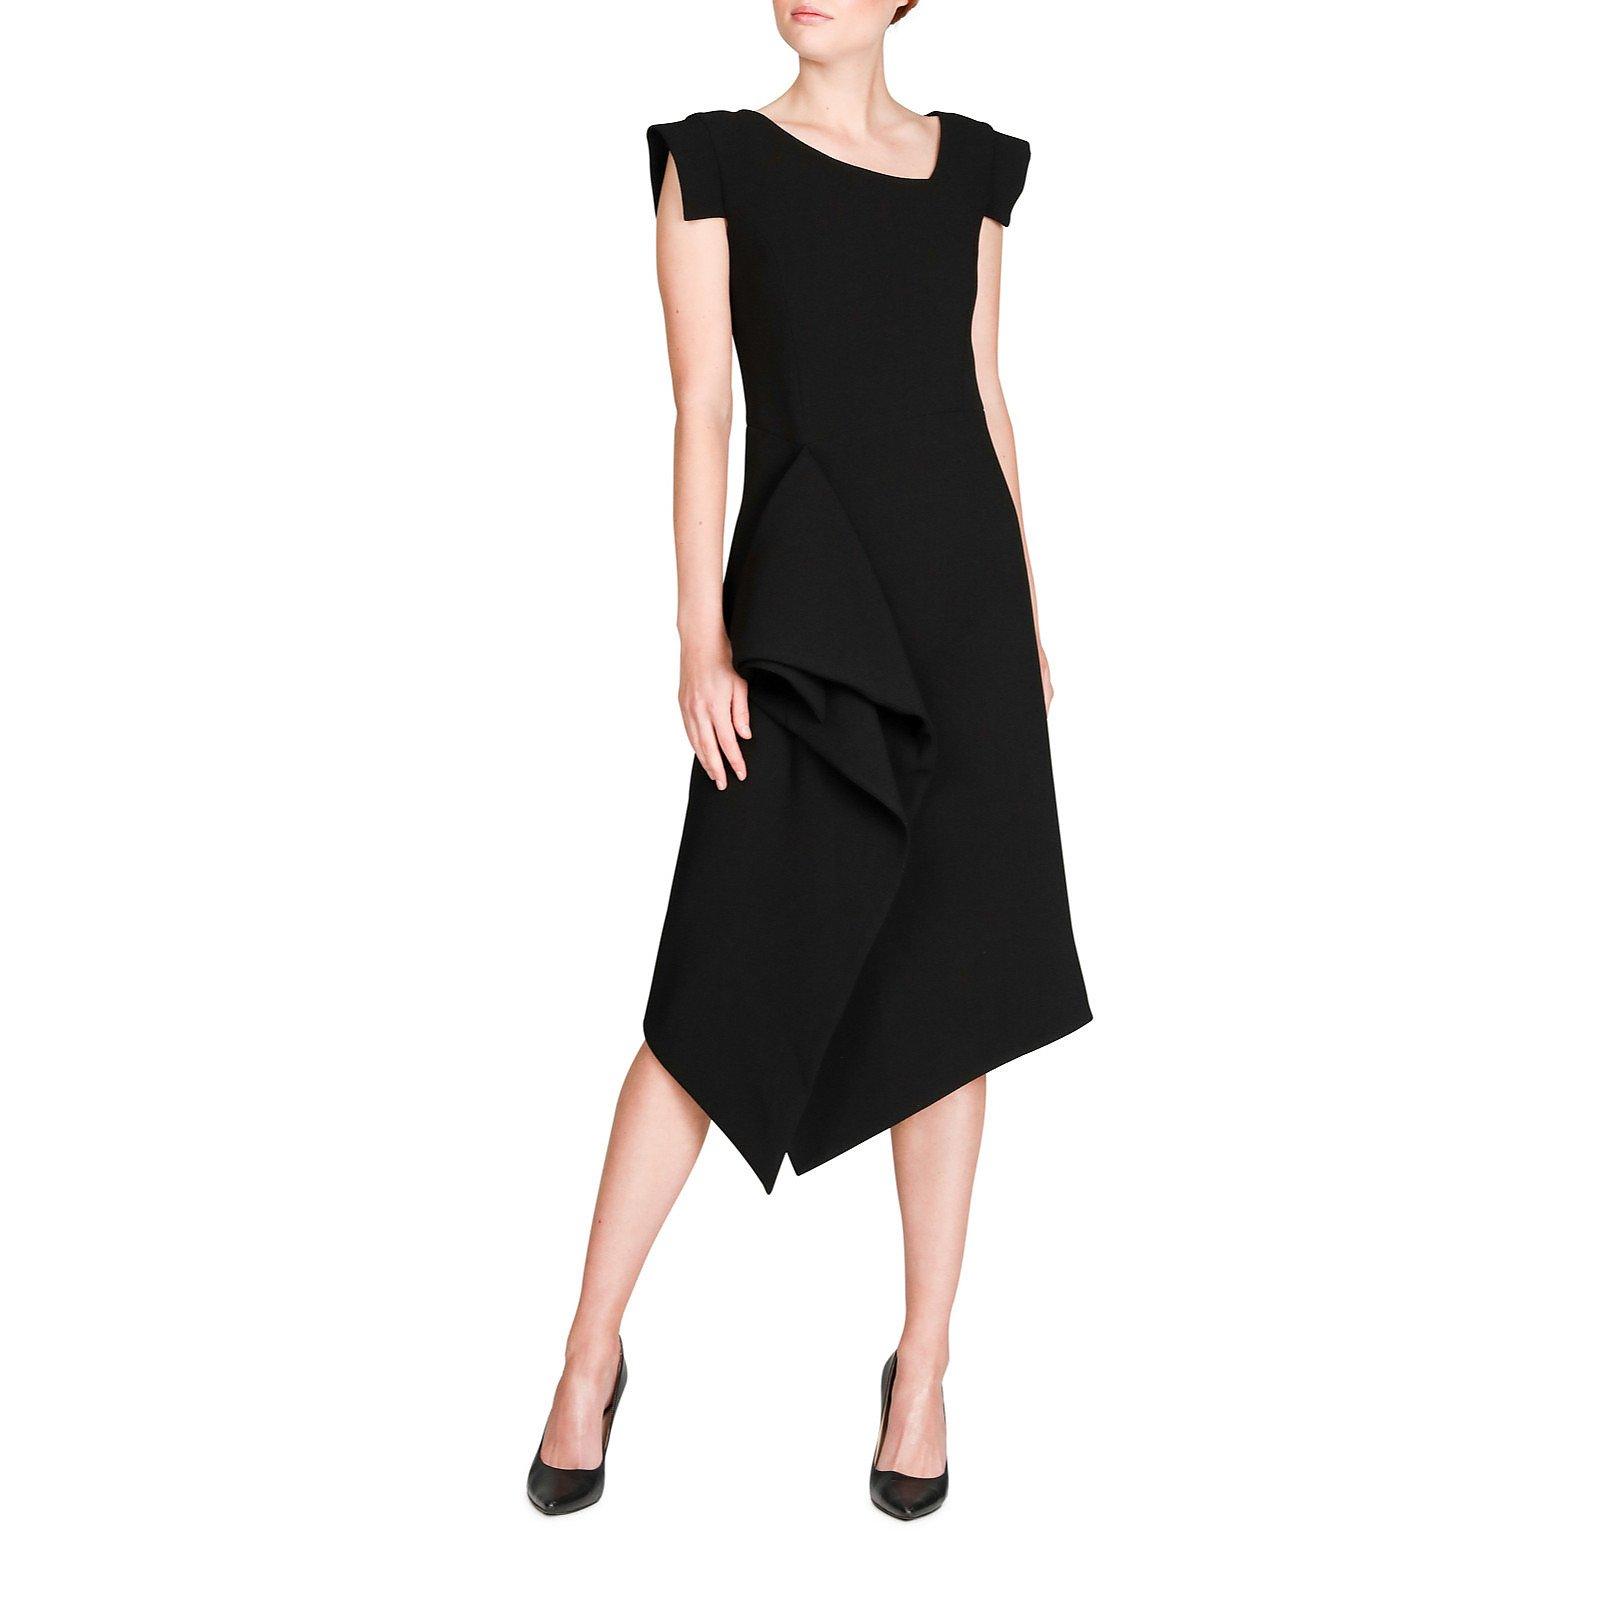 Karen Gee Acclaim Dress